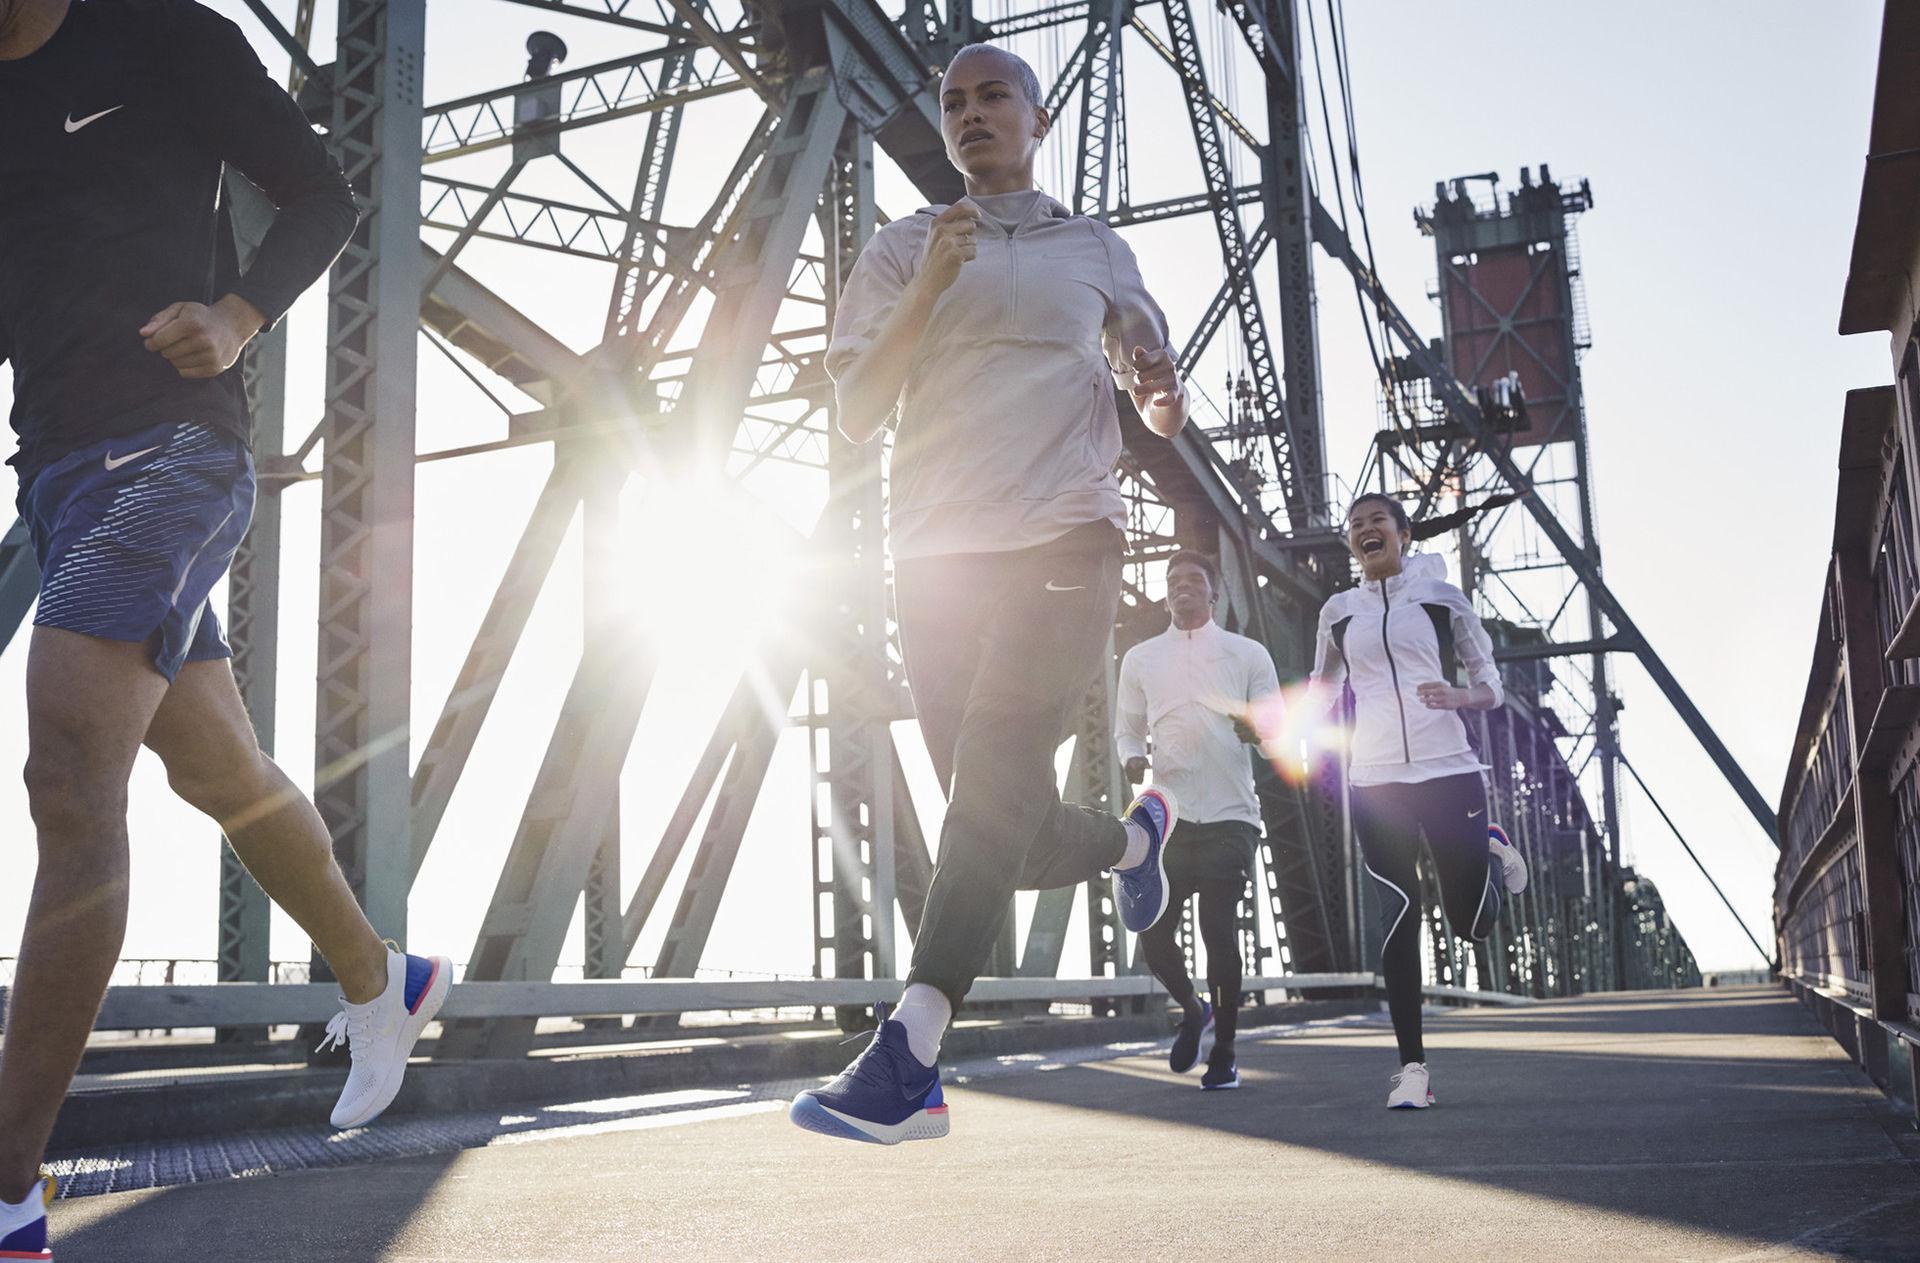 Epic React Flyknit - ny löparsko från Nike